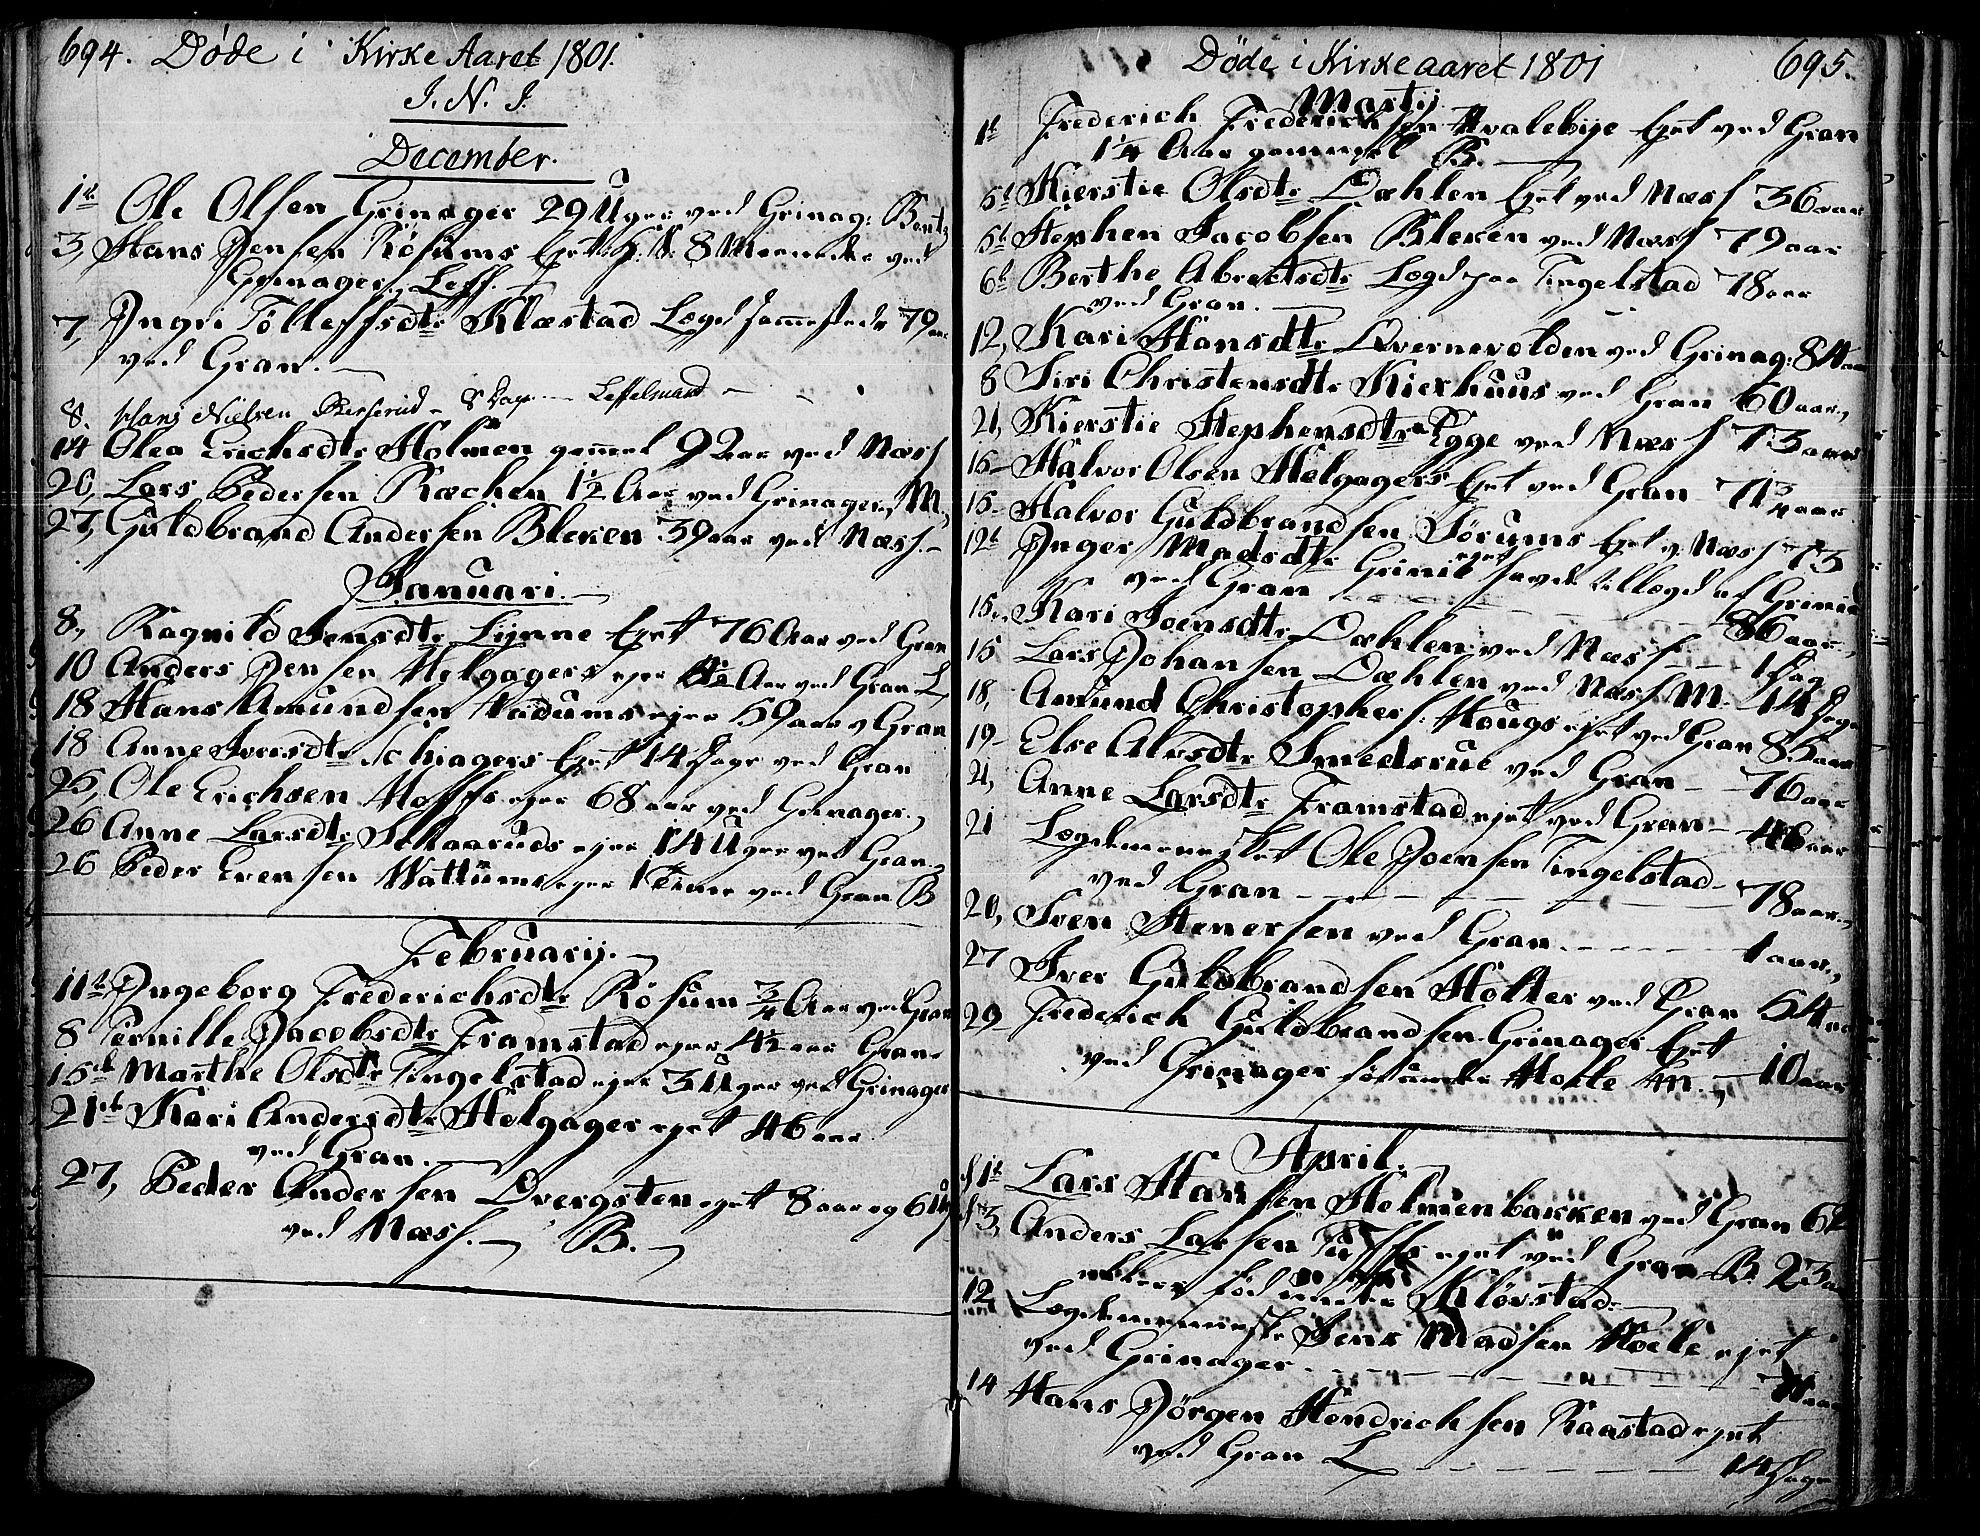 SAH, Gran prestekontor, Ministerialbok nr. 6, 1787-1824, s. 694-695